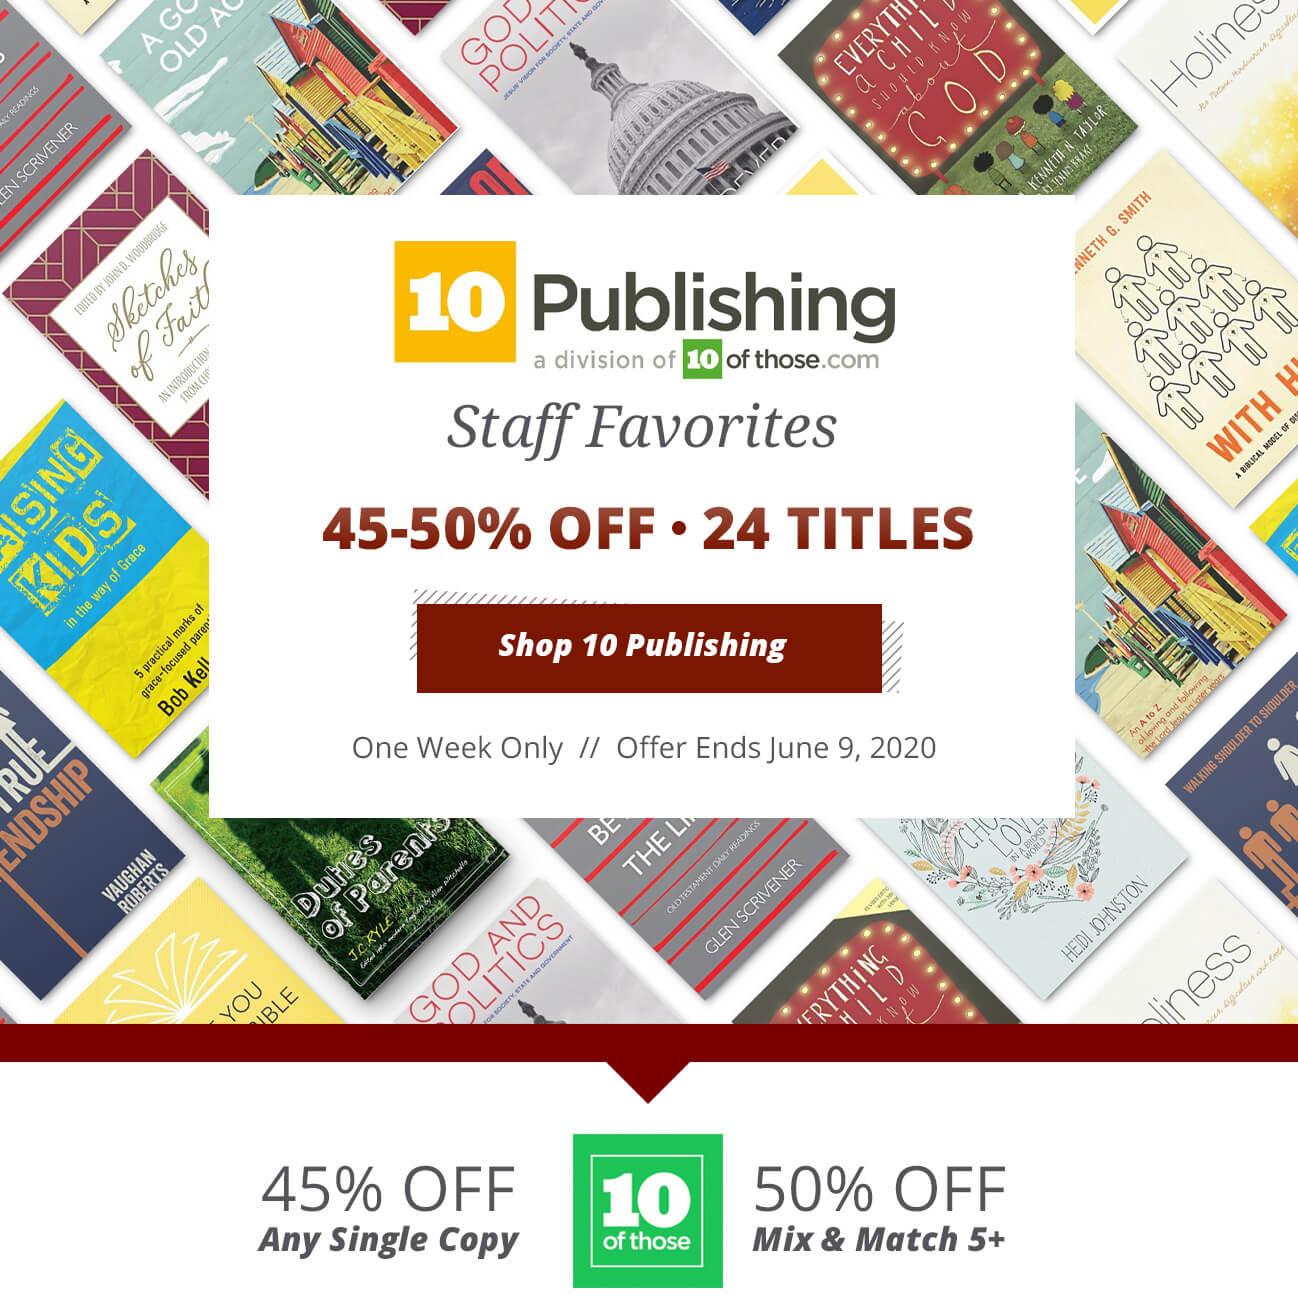 10 Publishing Staff Favorites